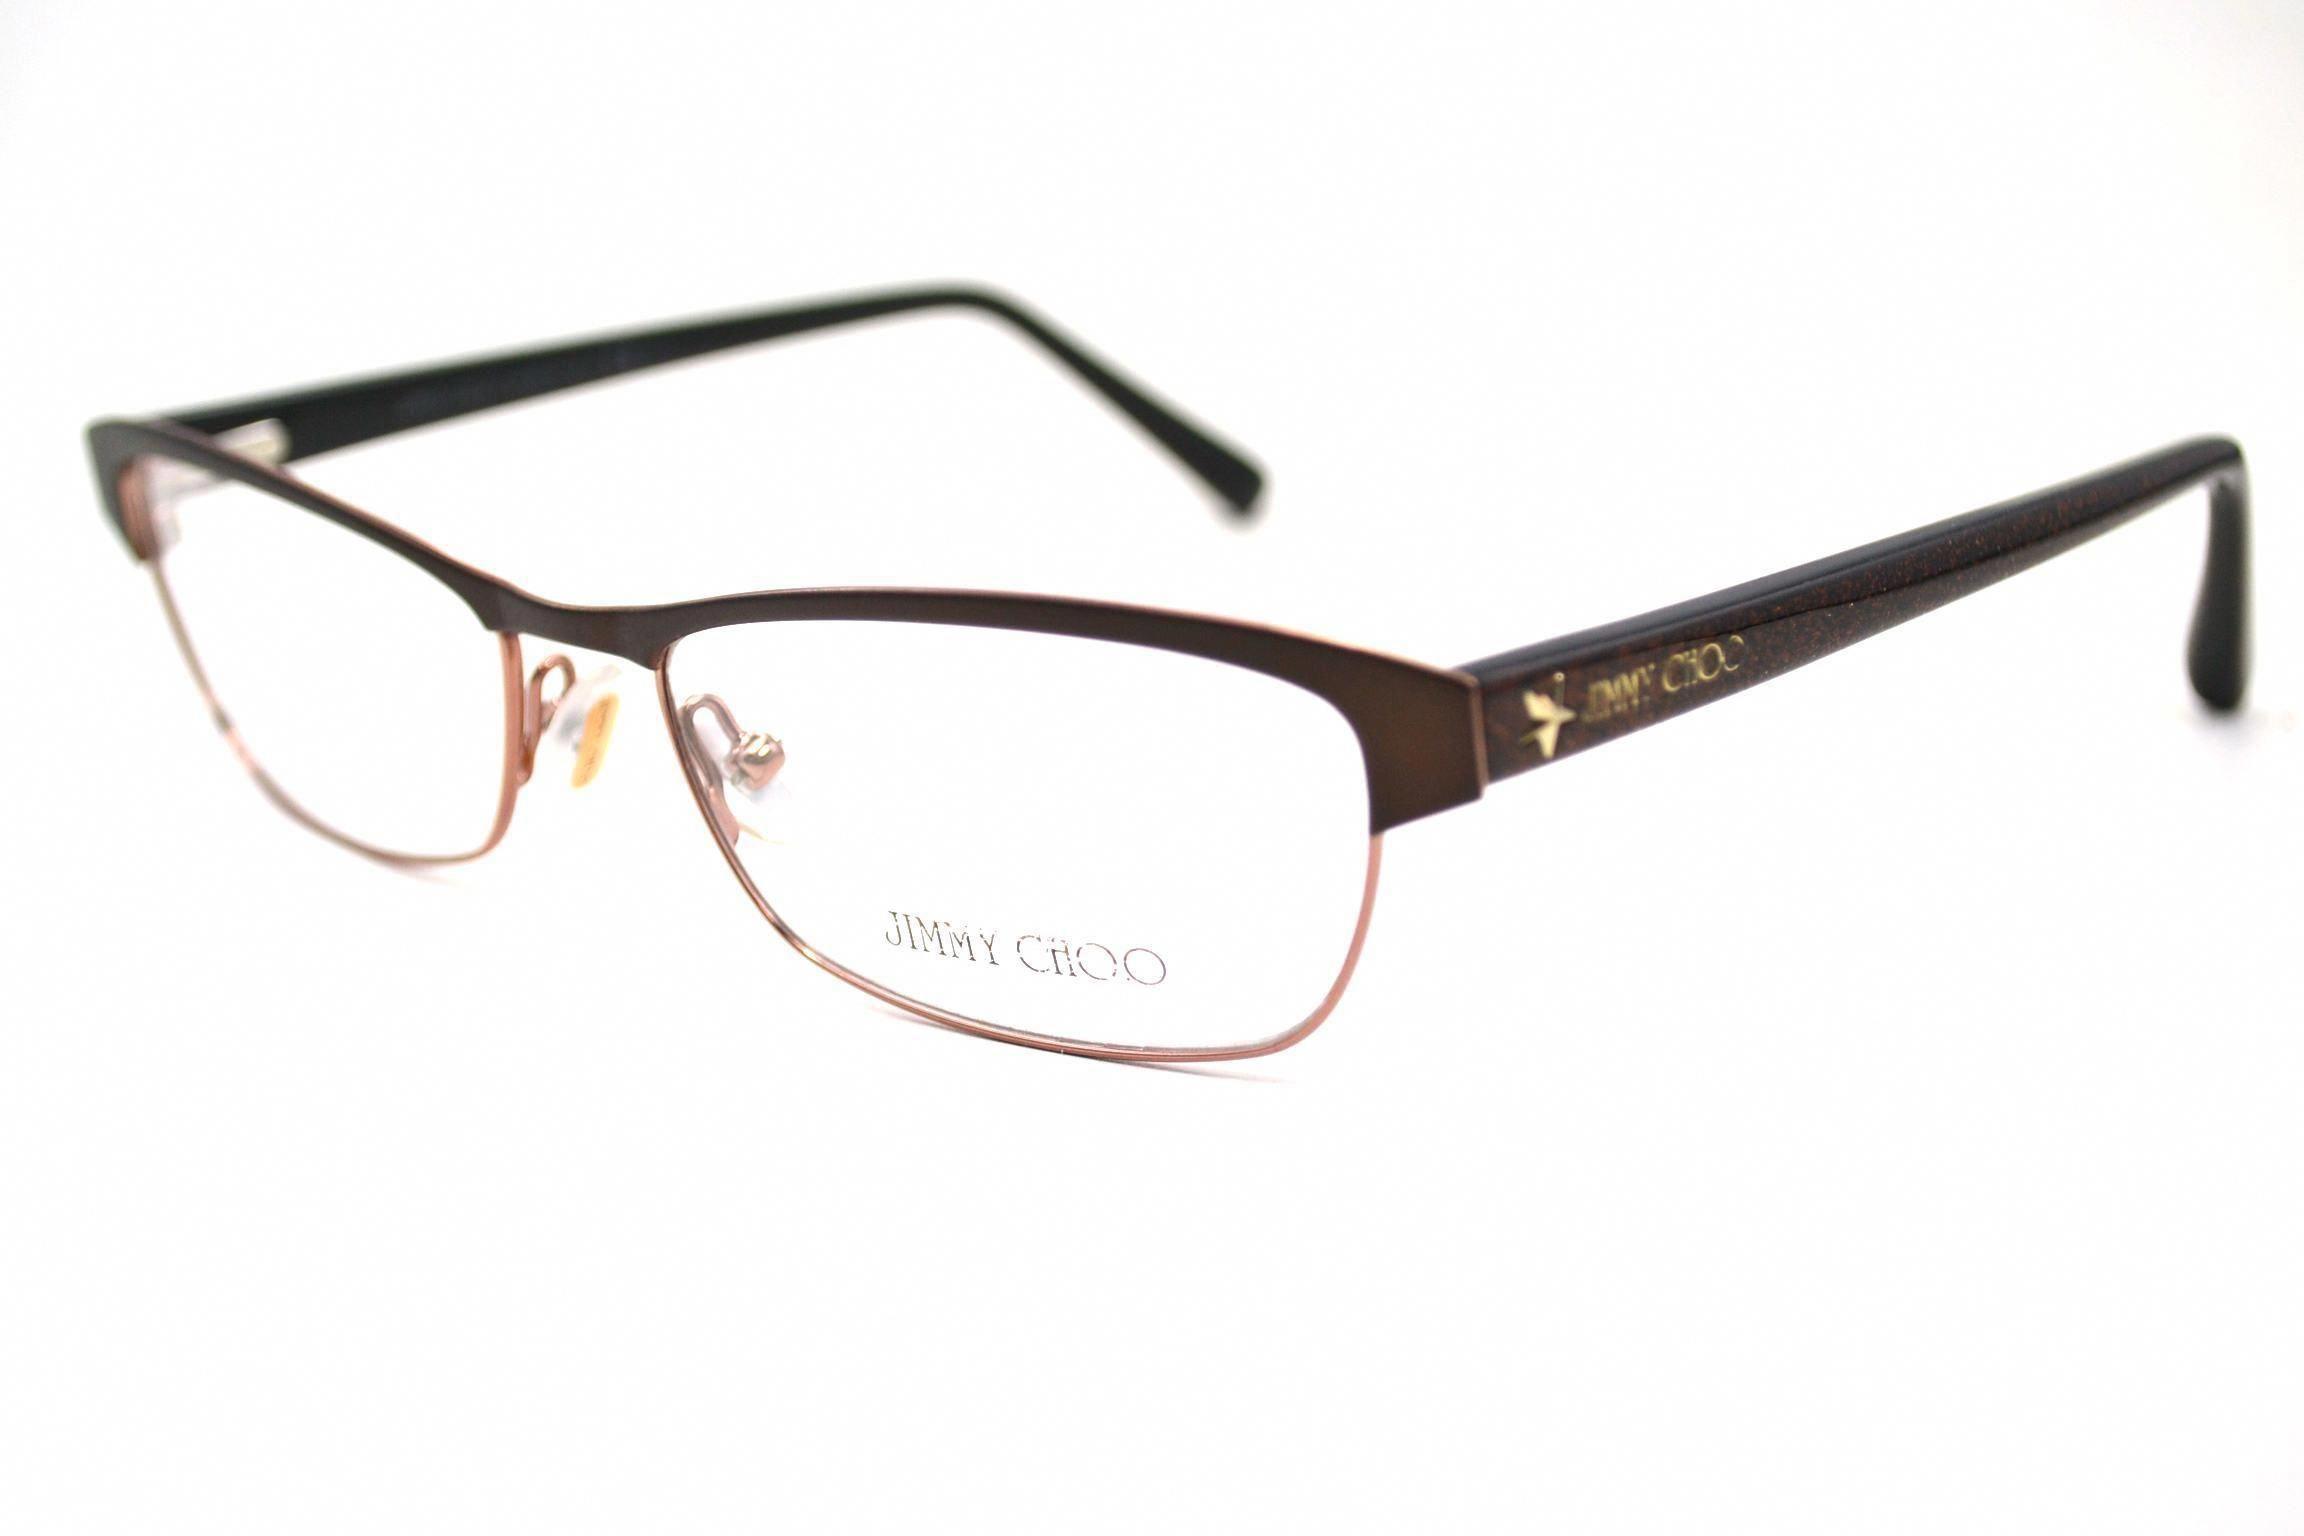 f78e896e3e10 jimmy choo glasses frames